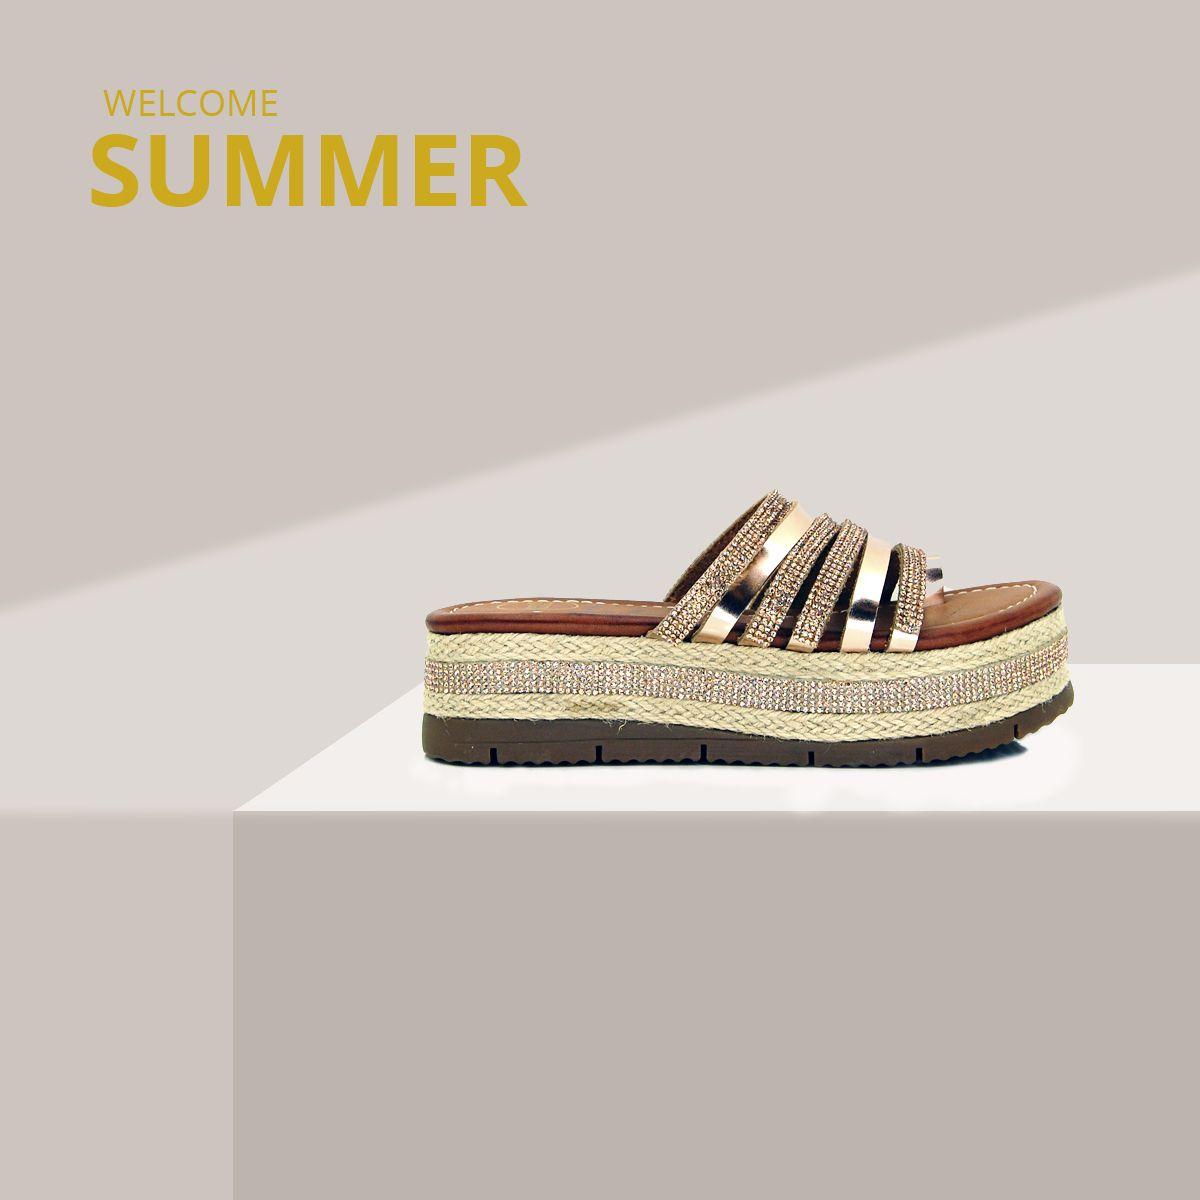 Con ellas tus pies lucirán este verano. Ver en PLATA y ORO 🔜 http://bit.ly/EXE-sandalia-METALIZADA #exeshoes #exeshoes_spain